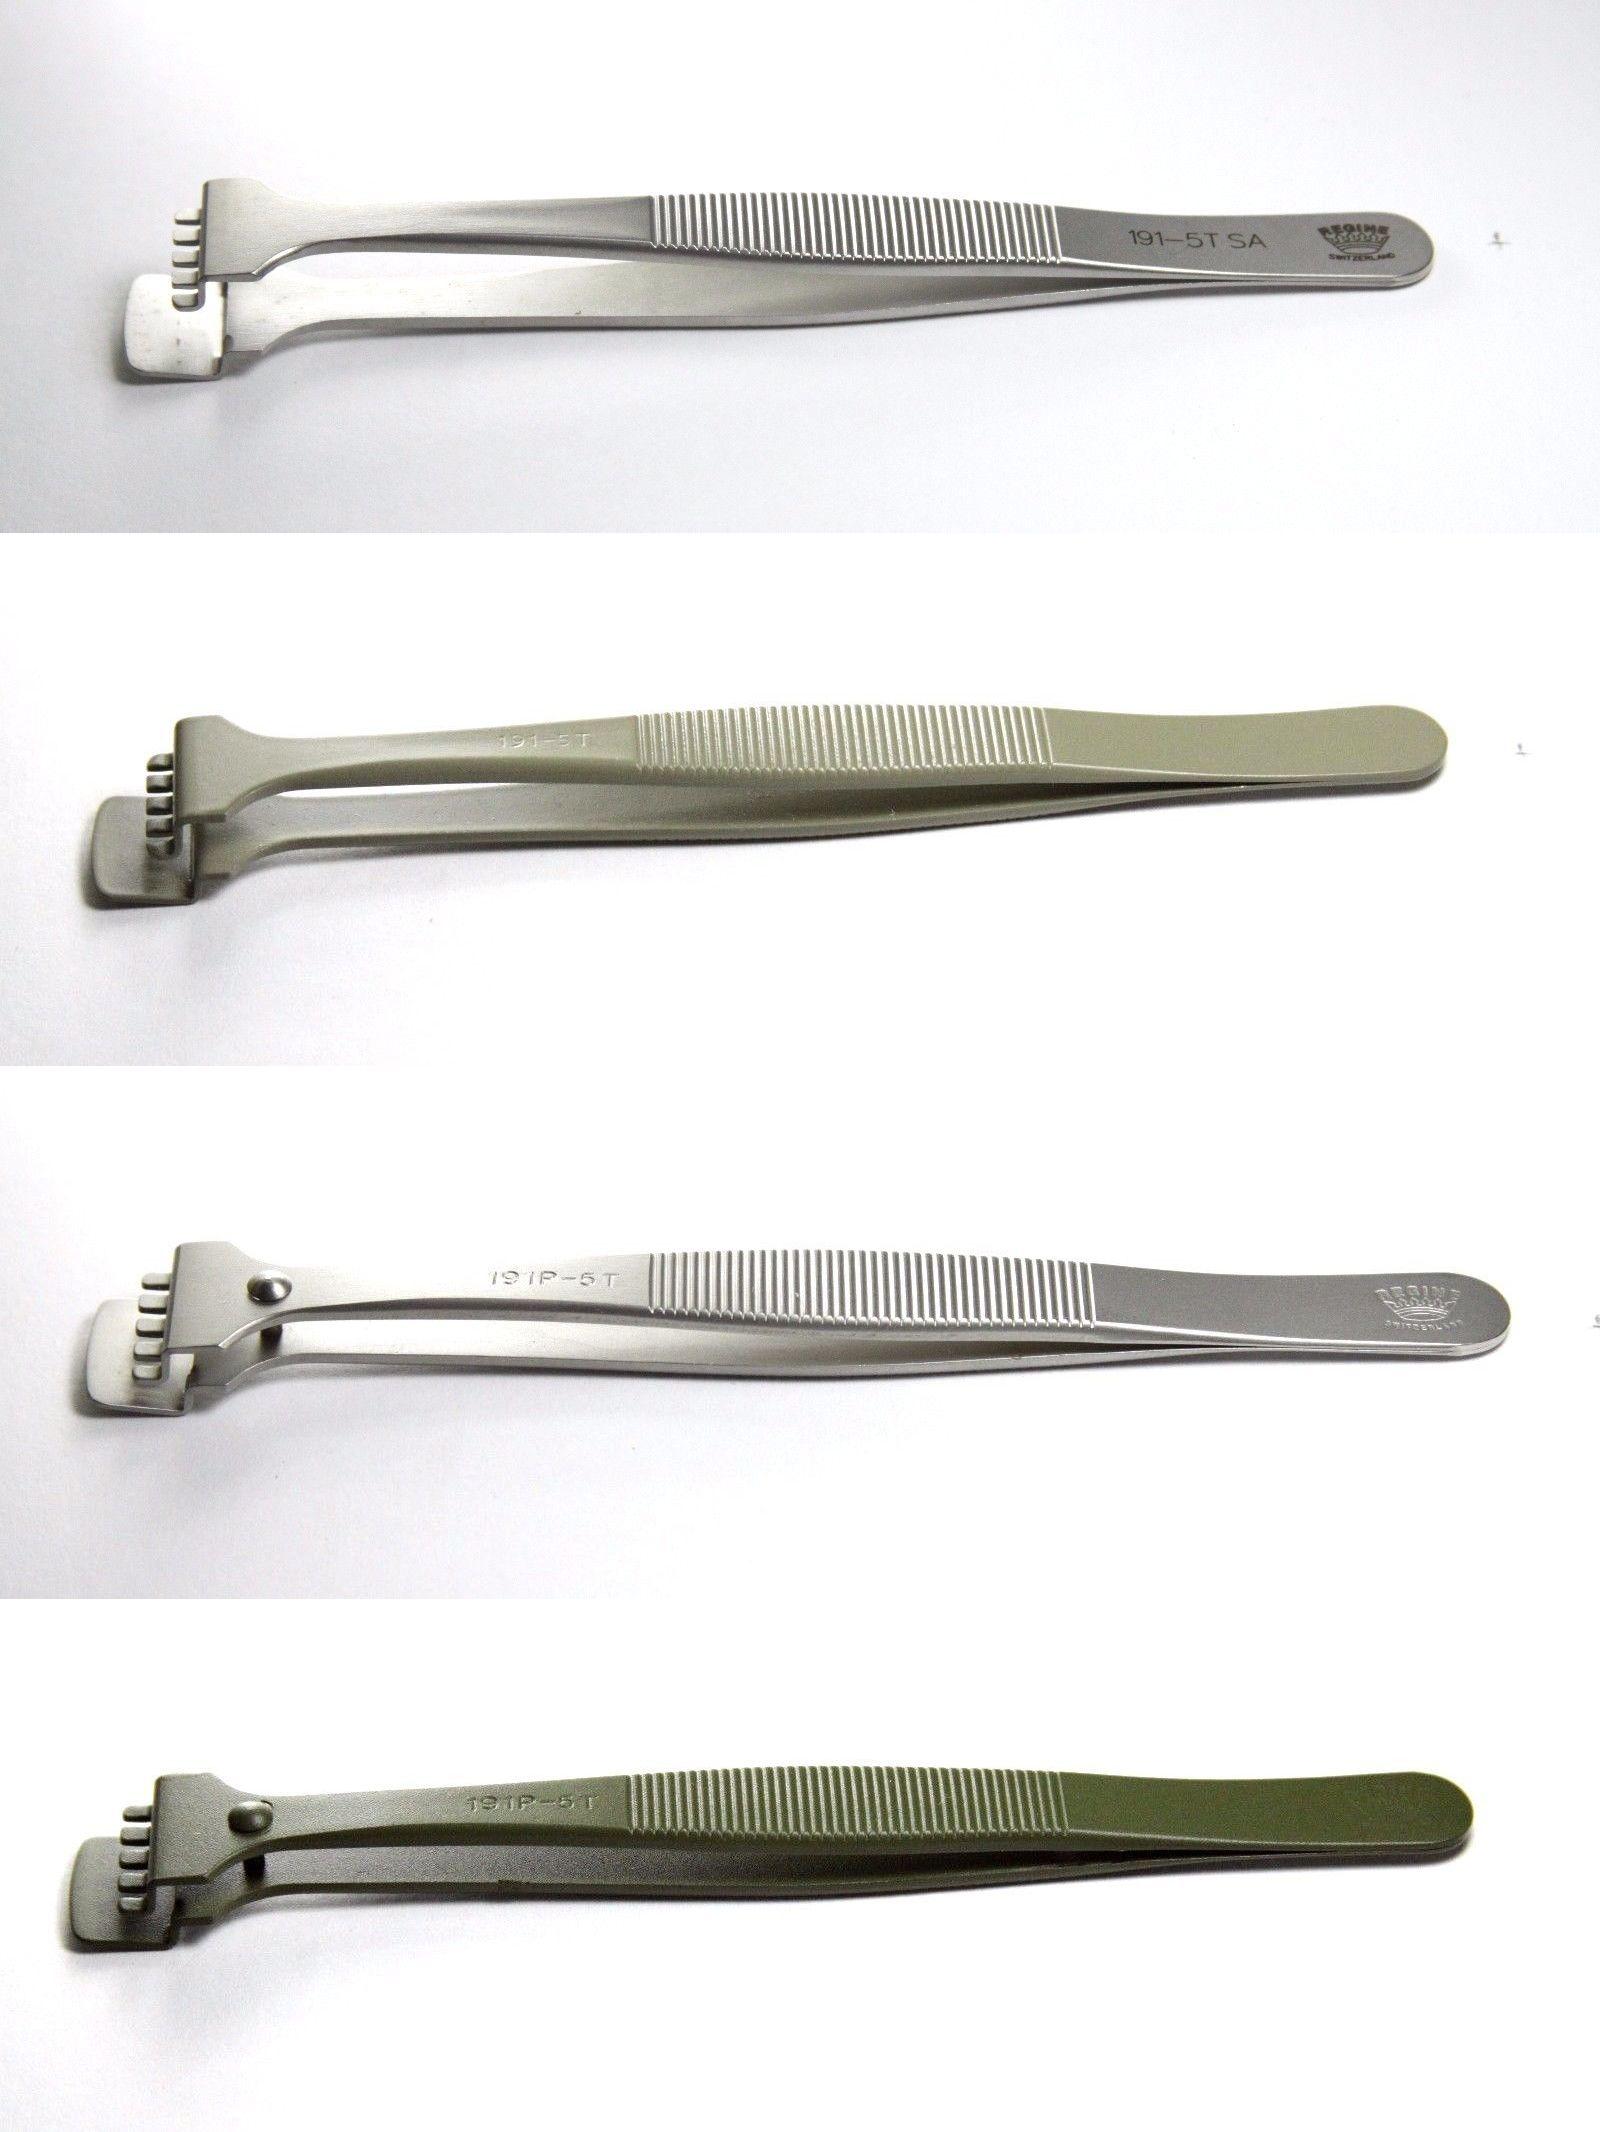 Regine 191-5T SA High Precision Wafer Handling Tweezers